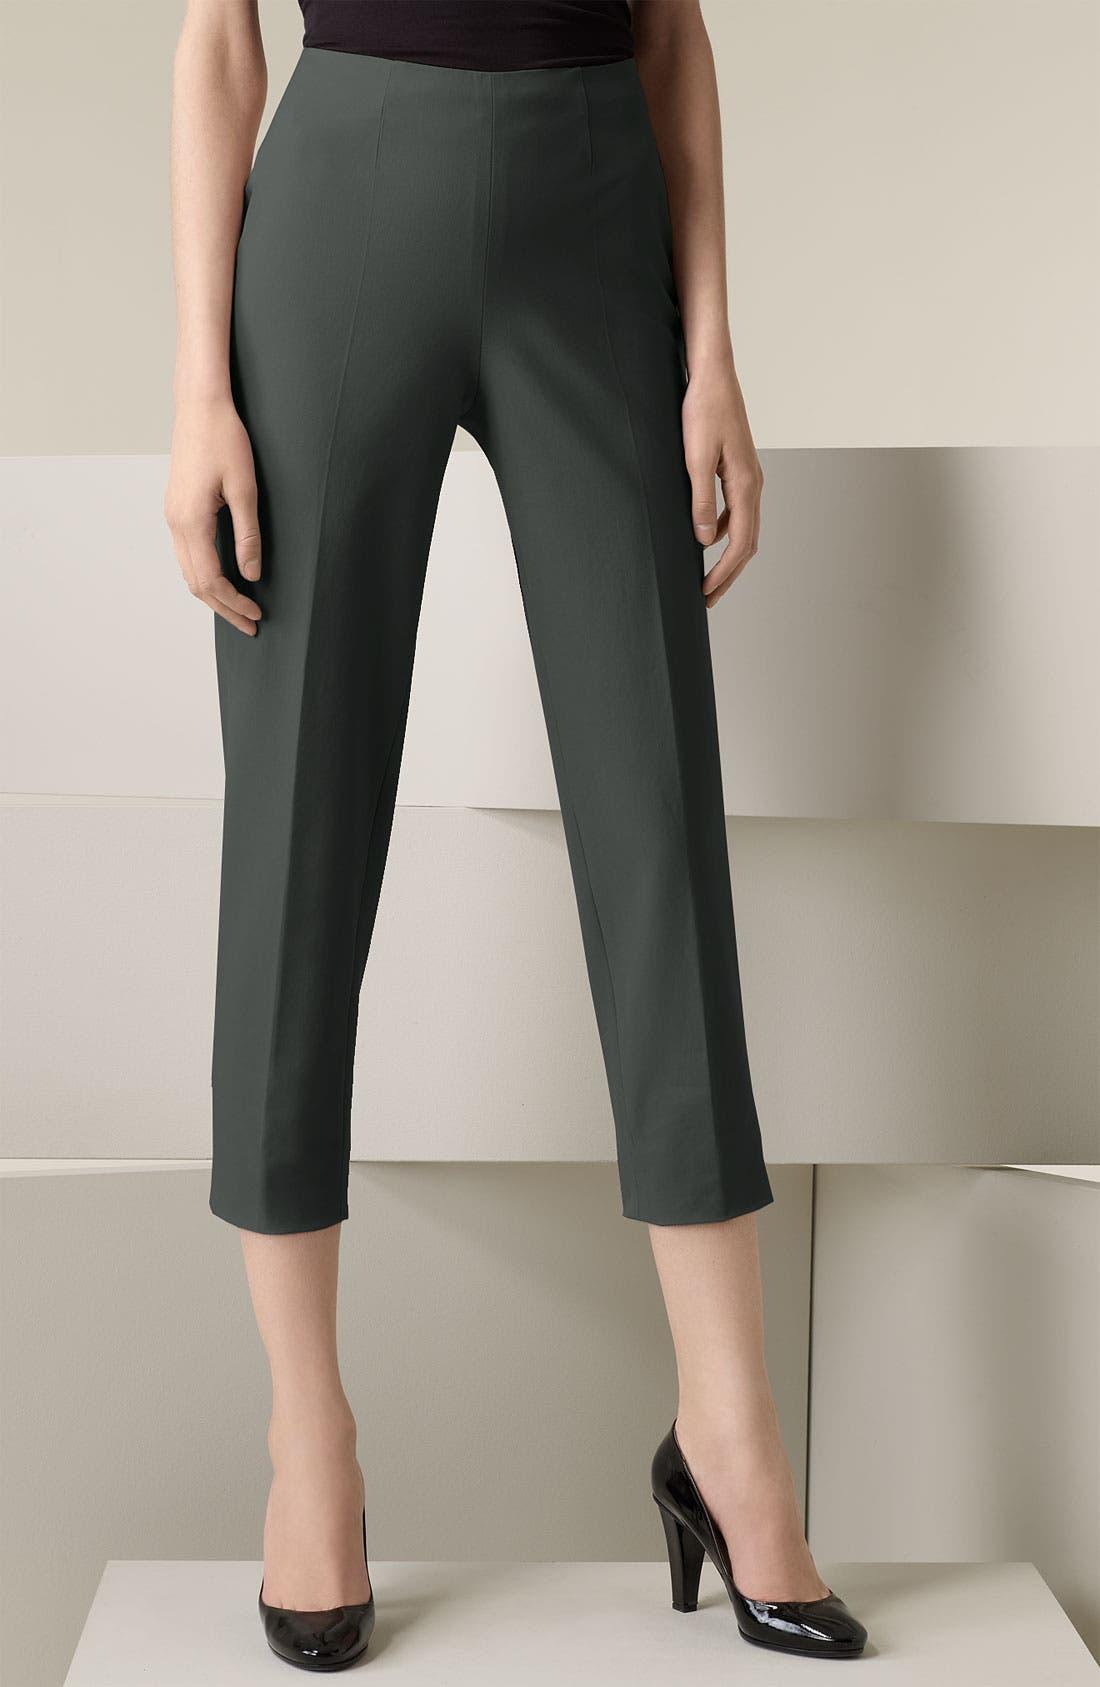 Alternate Image 1 Selected - Piazza Sempione 'Audrey' Stretch Cotton Gabardine Capris